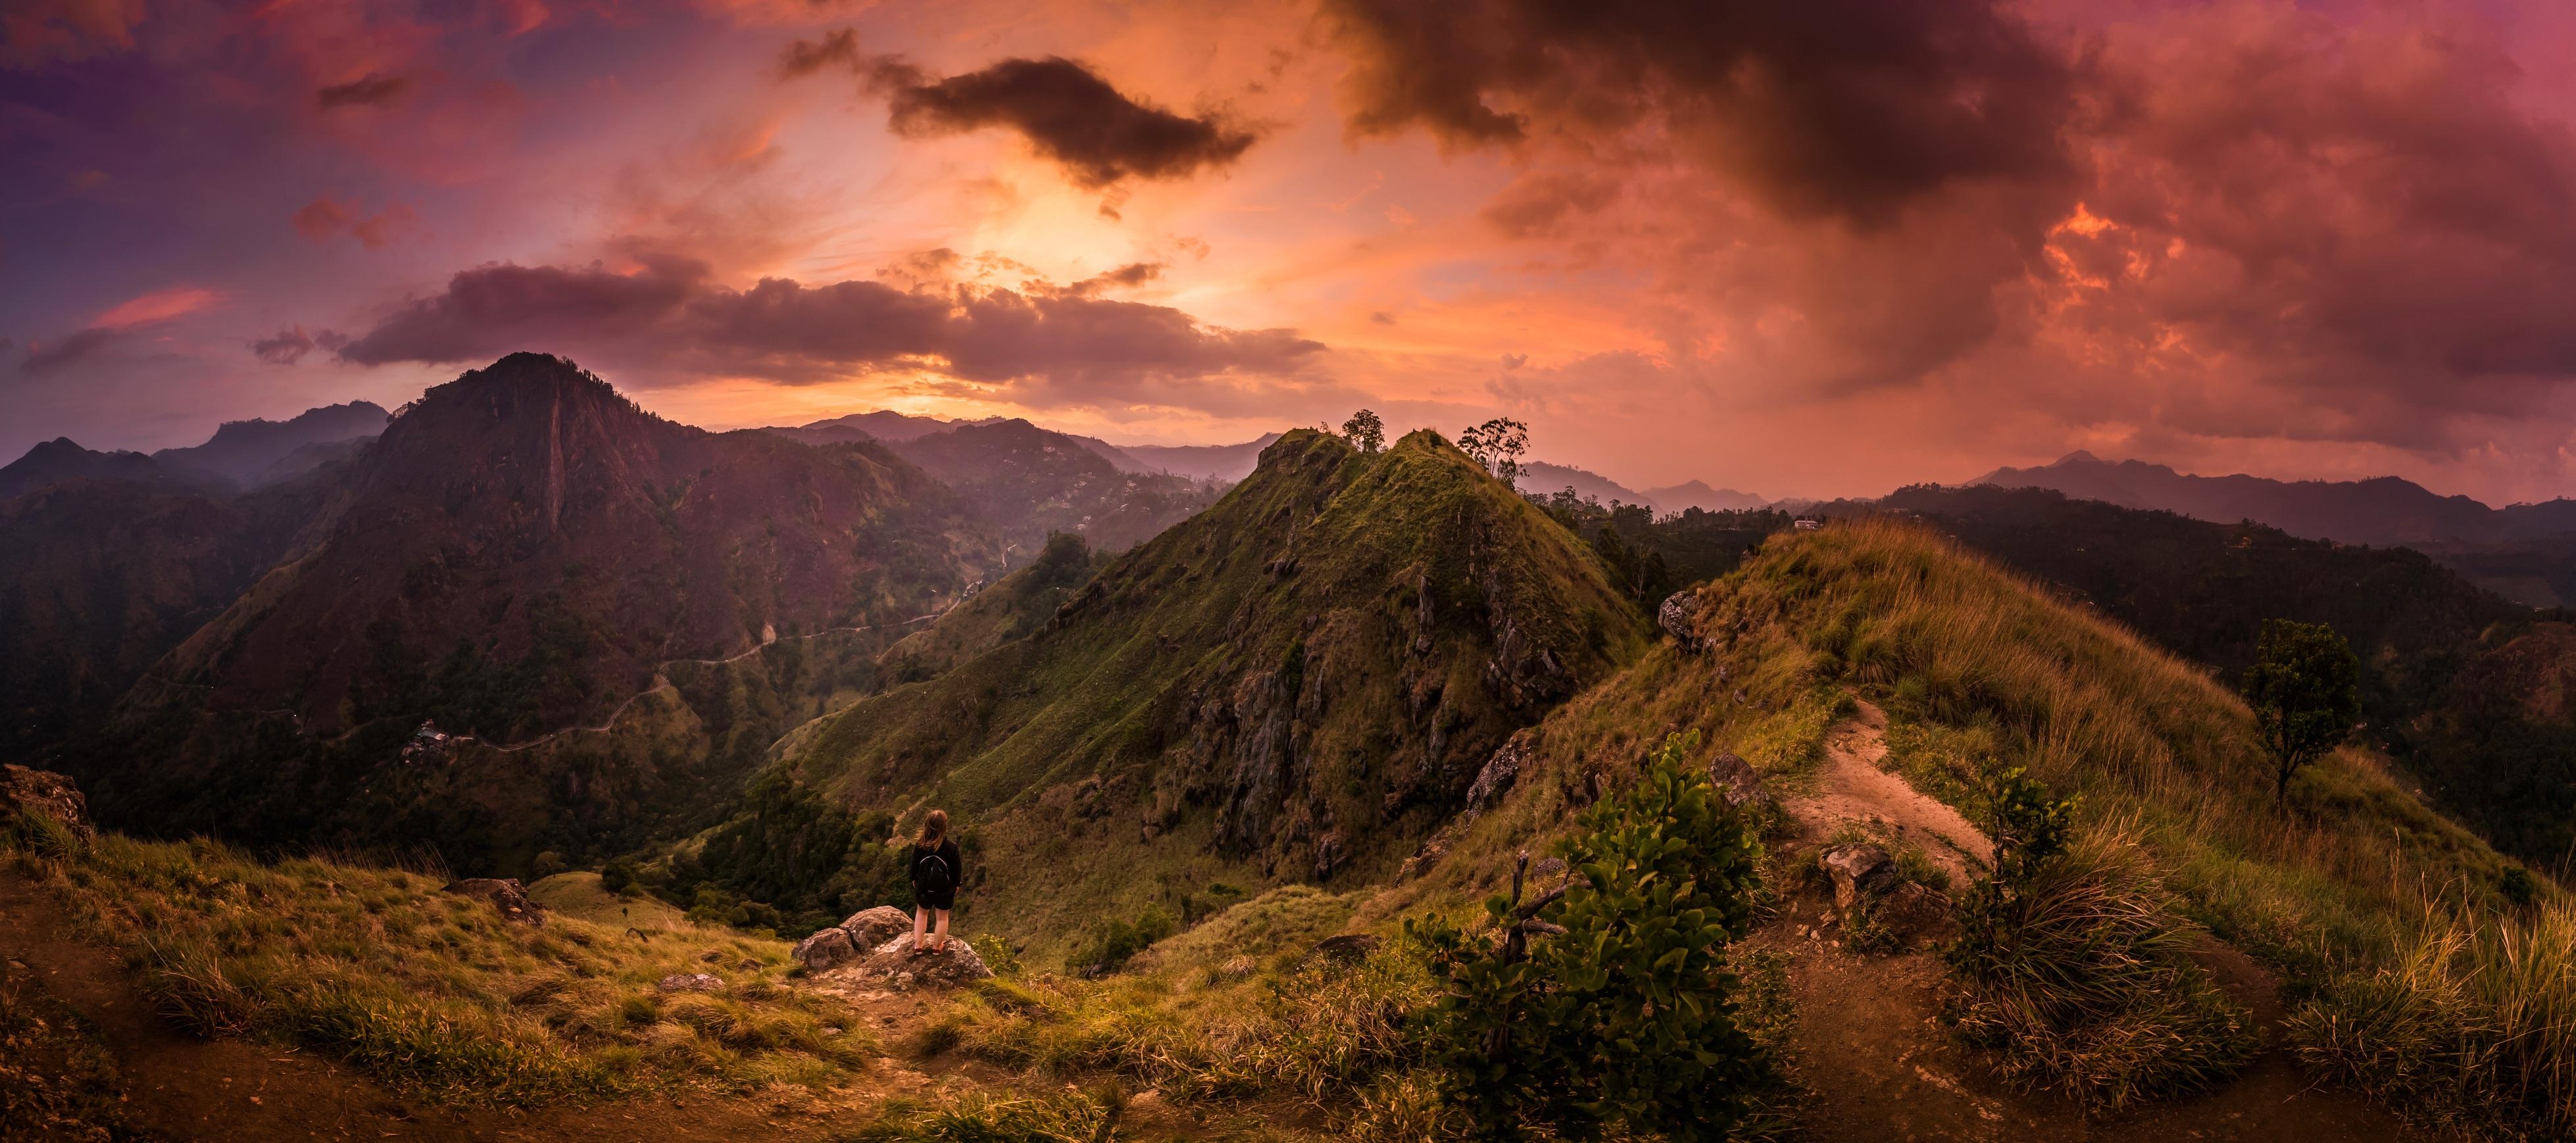 закат горы холмы sunset mountains hills скачать